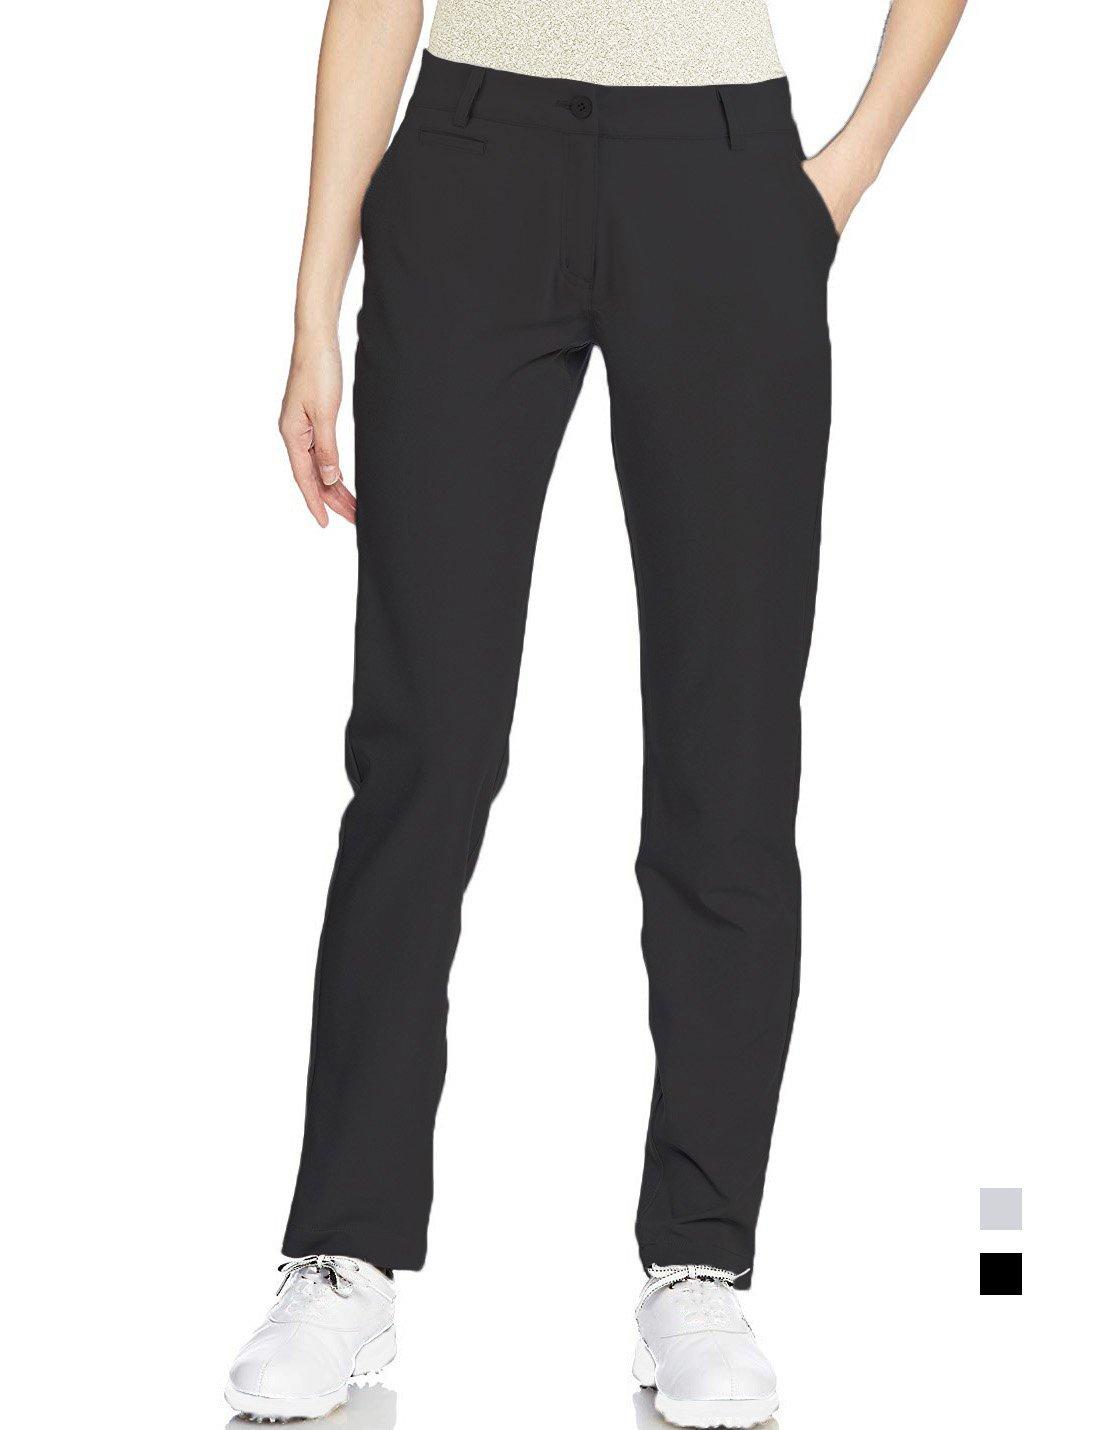 Golf Pants Women Long Stretch Tall Straight Leg Twill Work Chino Ladies Size 4 Black